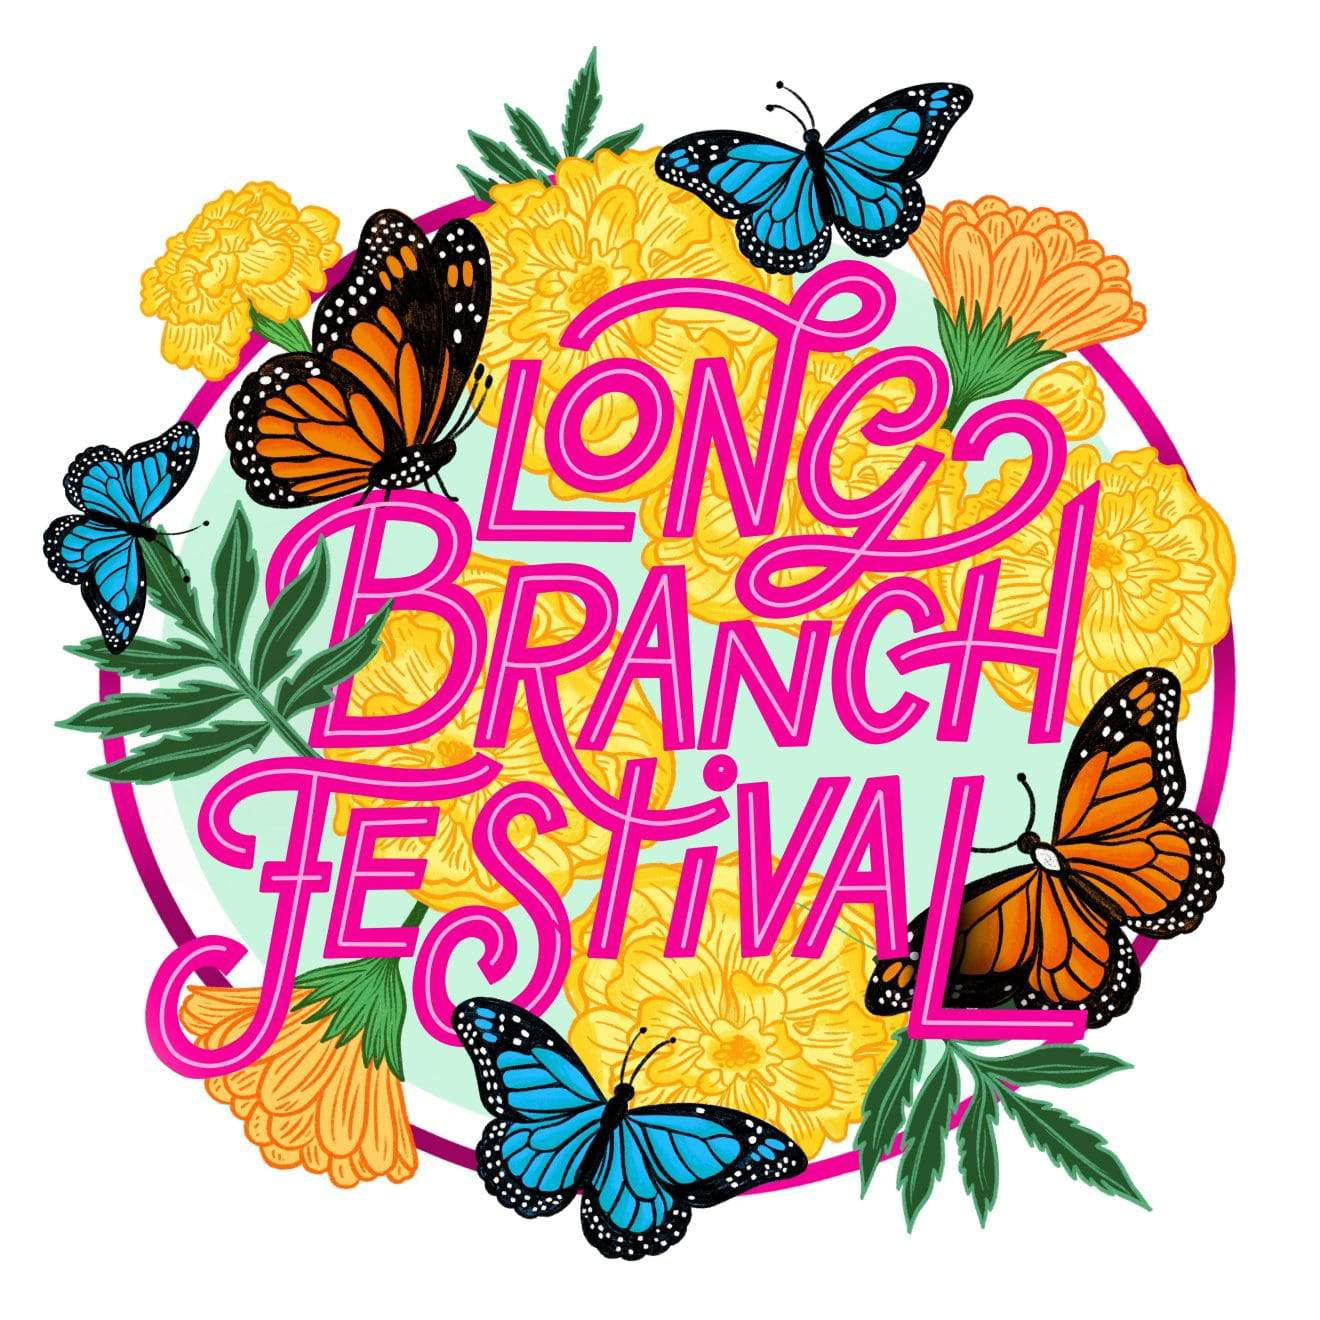 Long Branch Festival